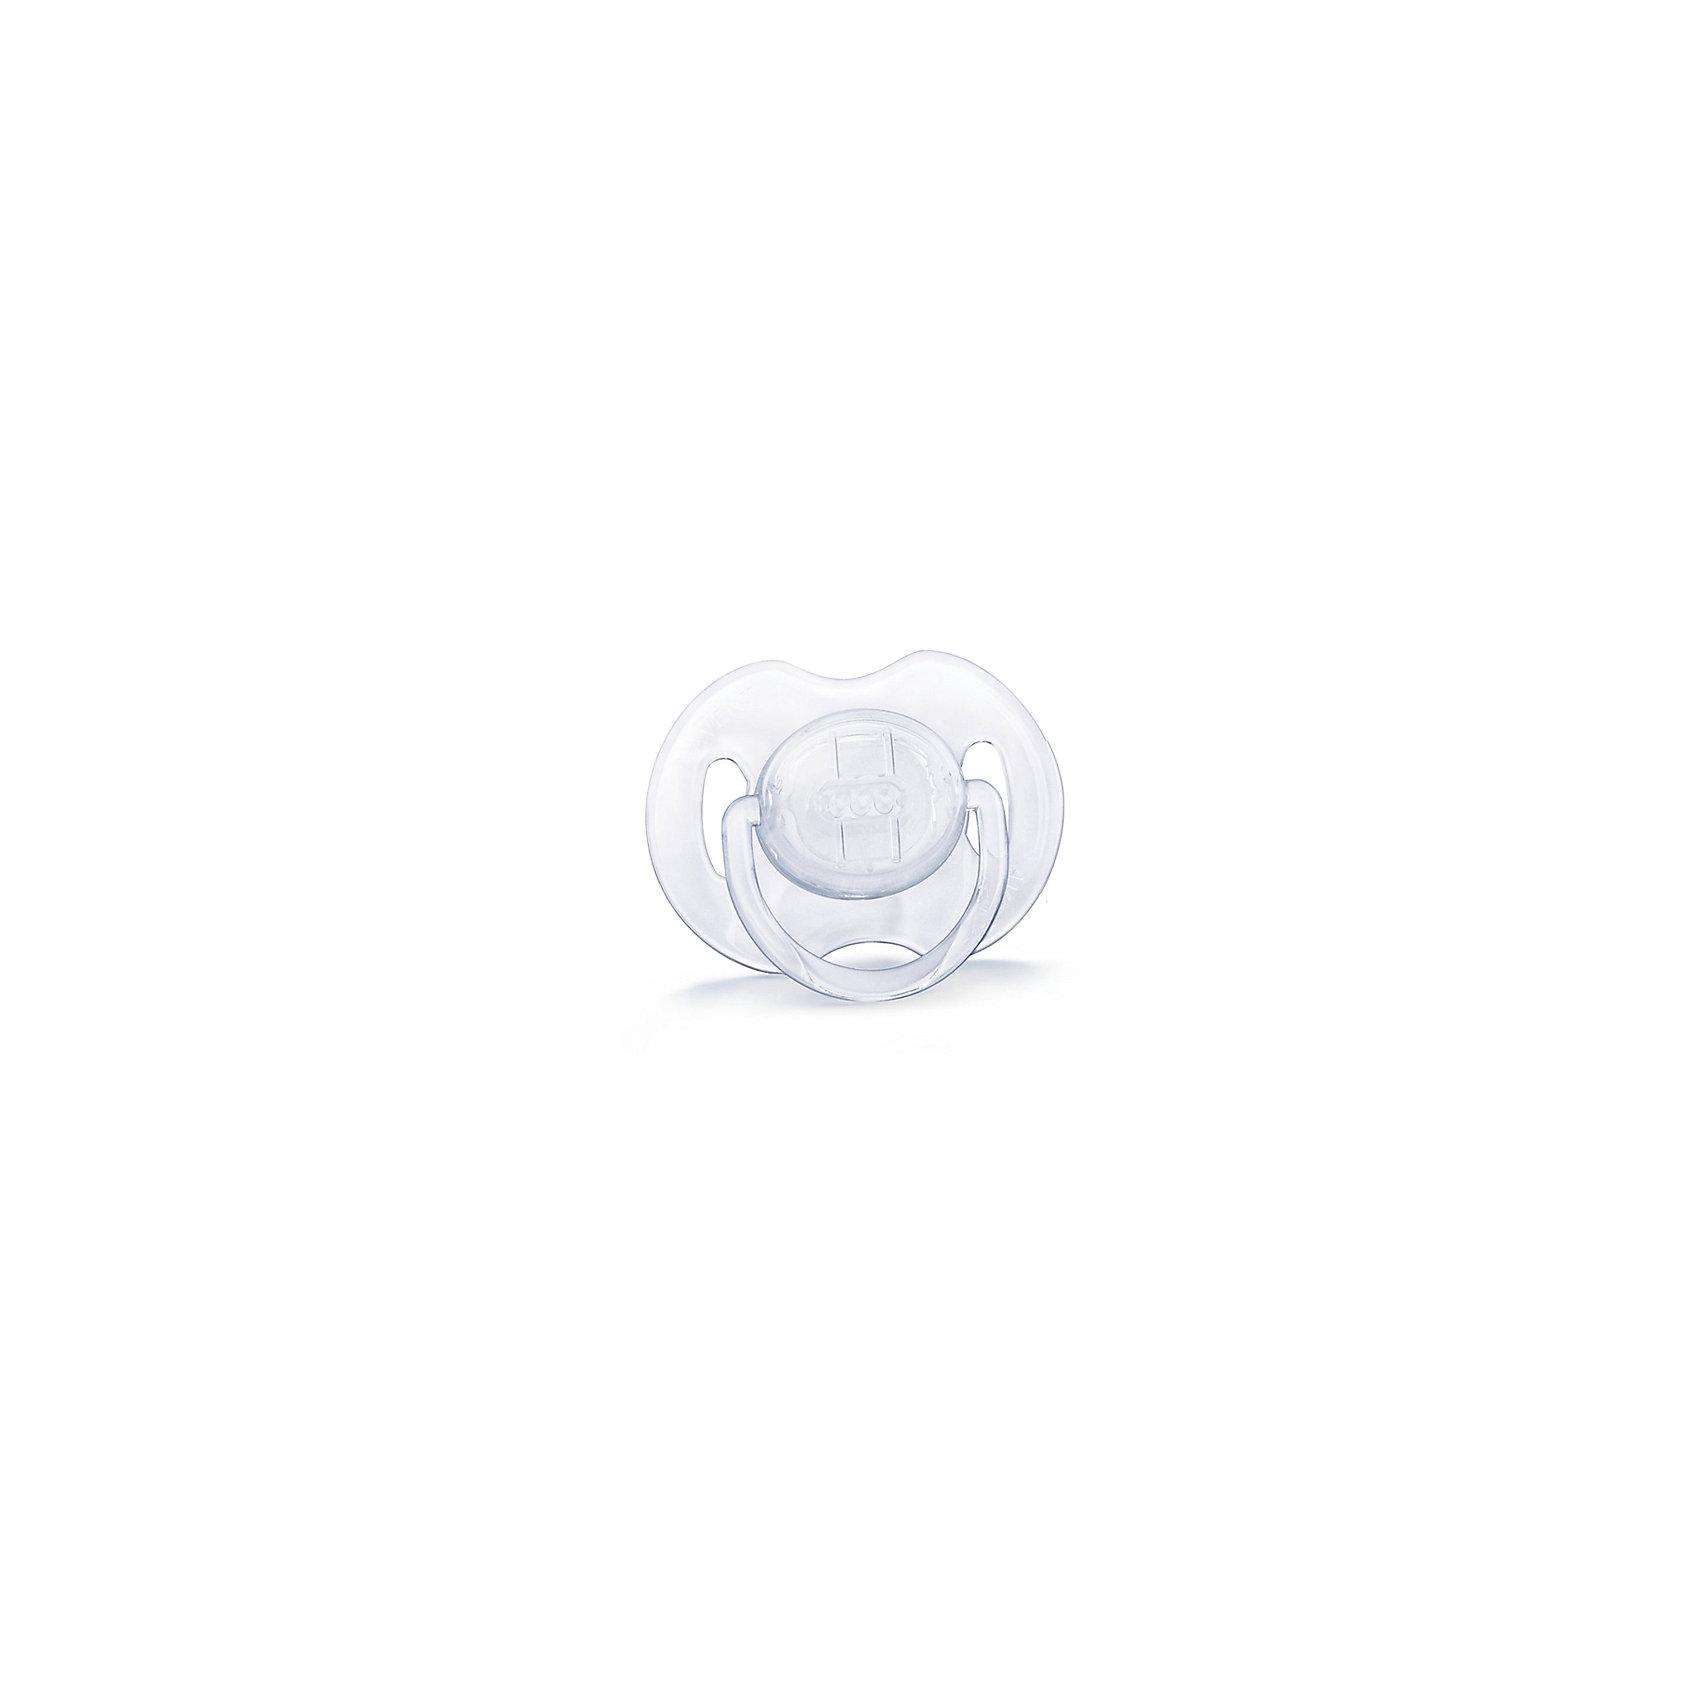 PHILIPS AVENT Силиконовая пустышка Классика, 0-6 мес., 2 шт., AVENT, белый